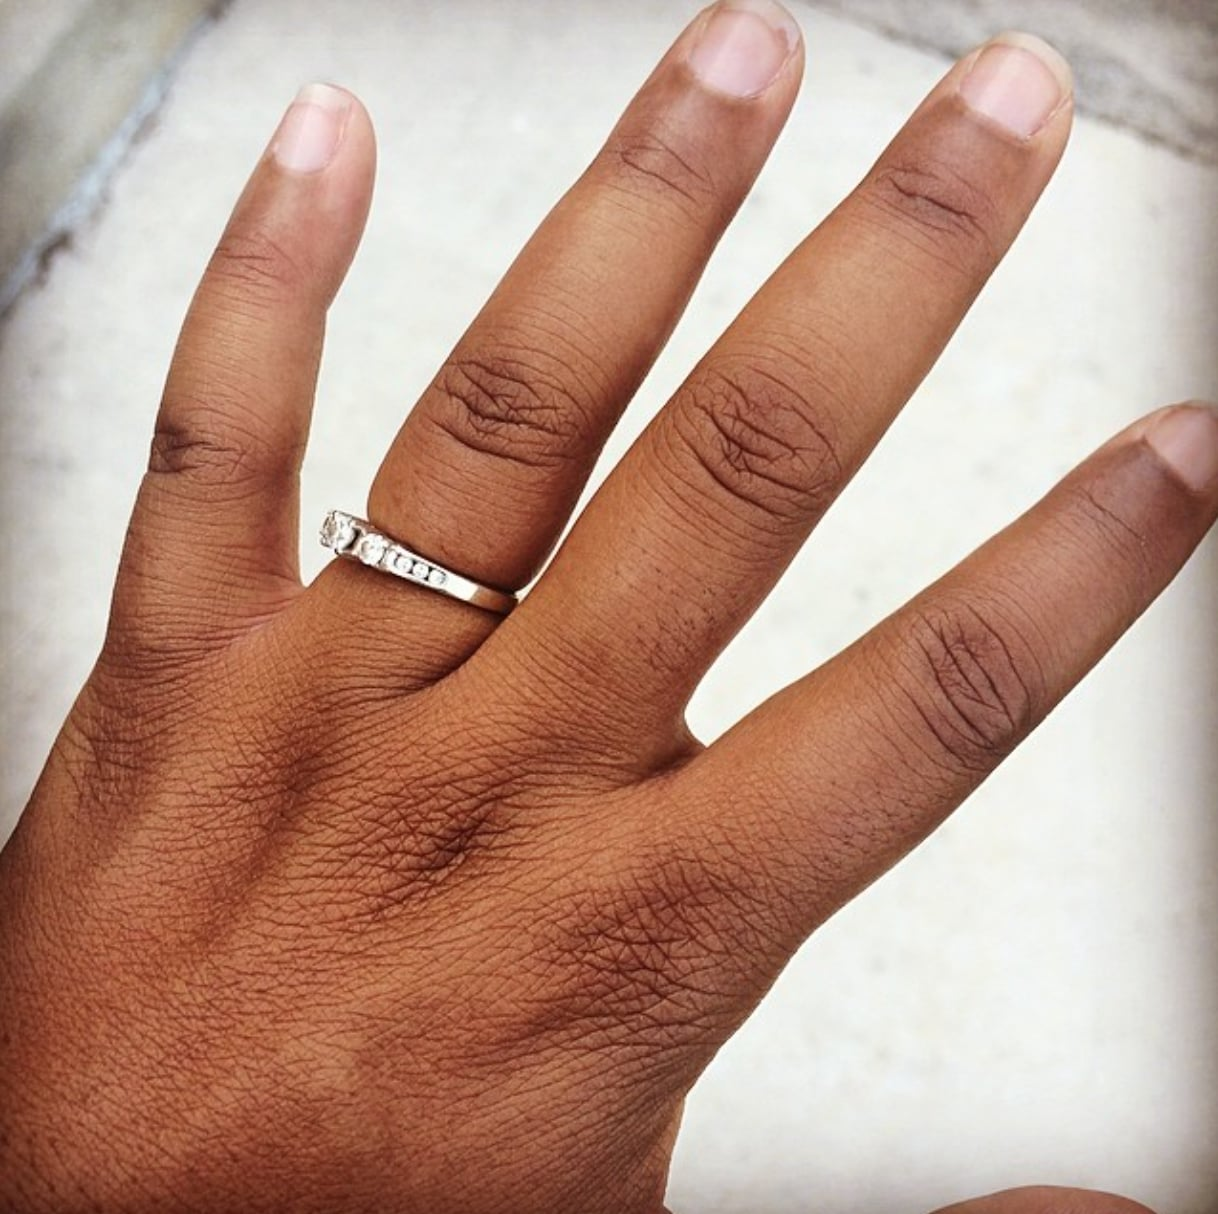 Pregnancy Fingers